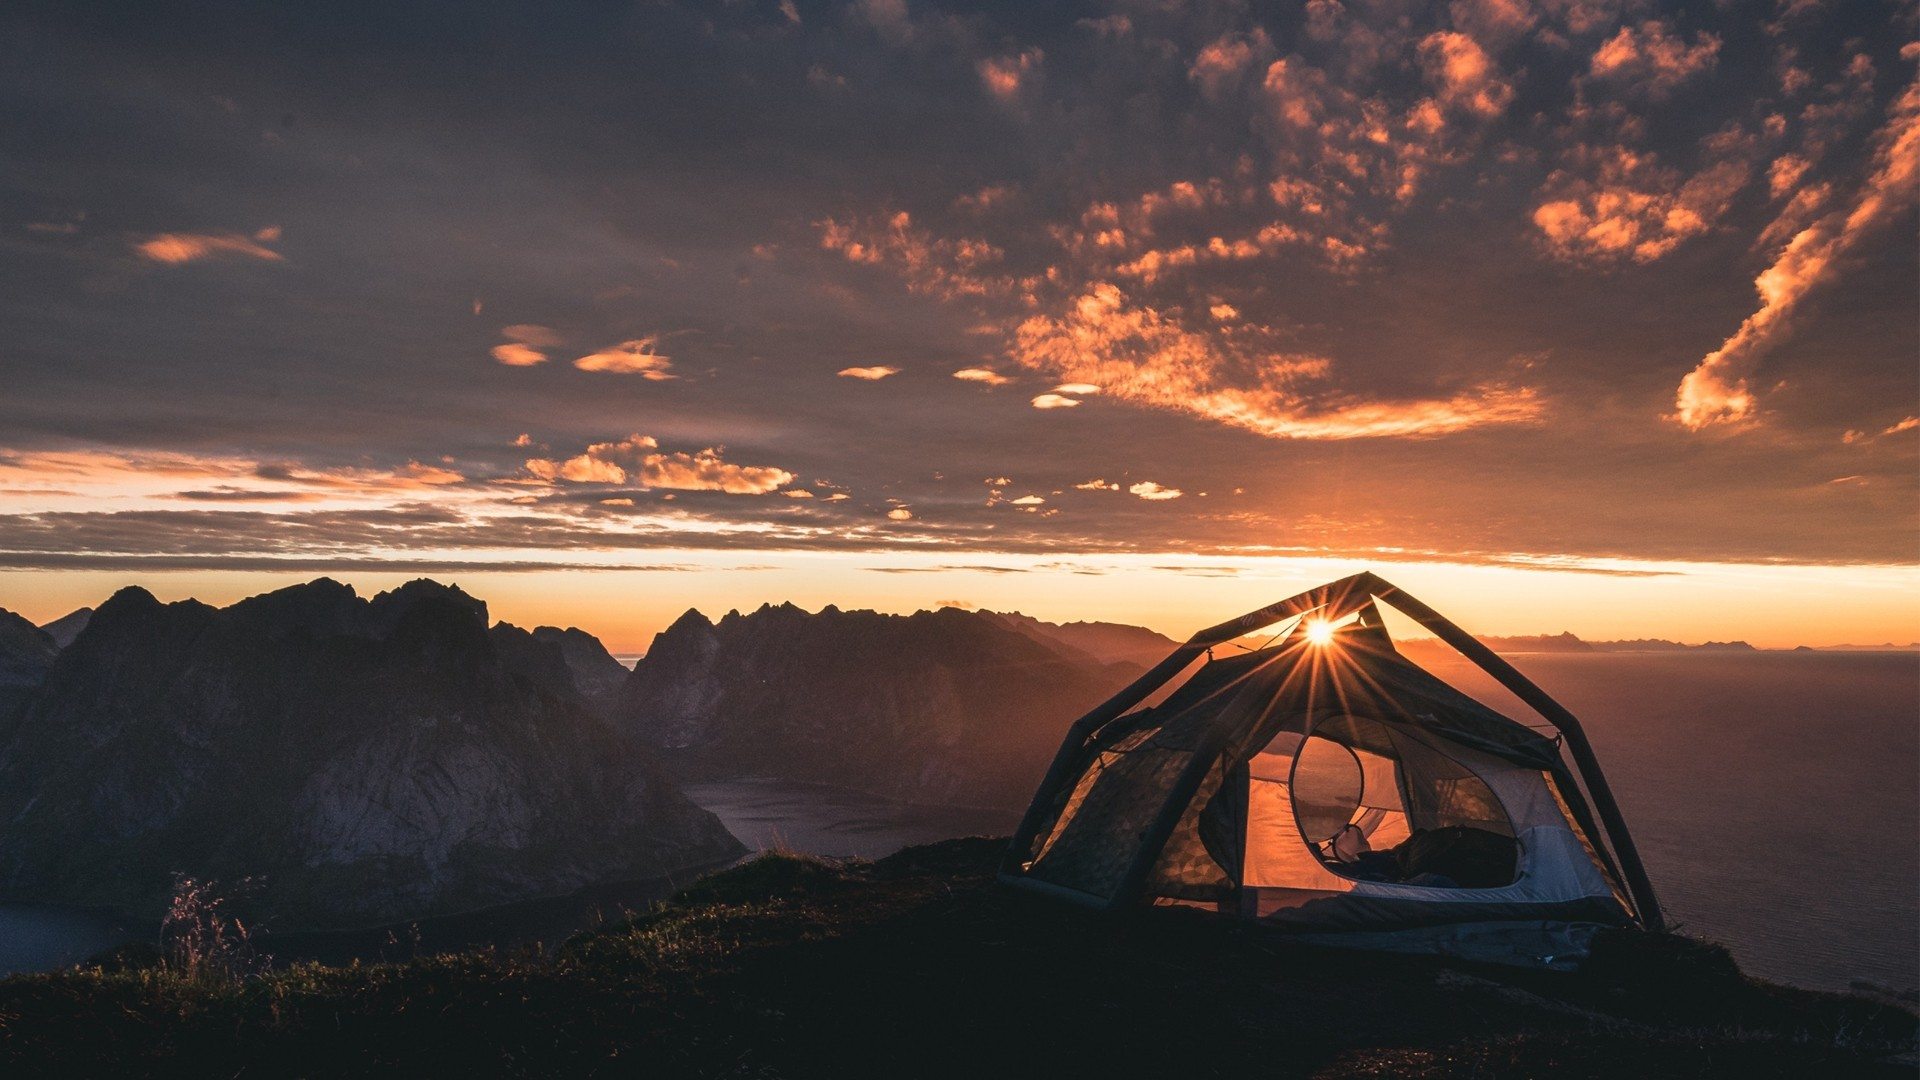 Camping Free Wallpaper